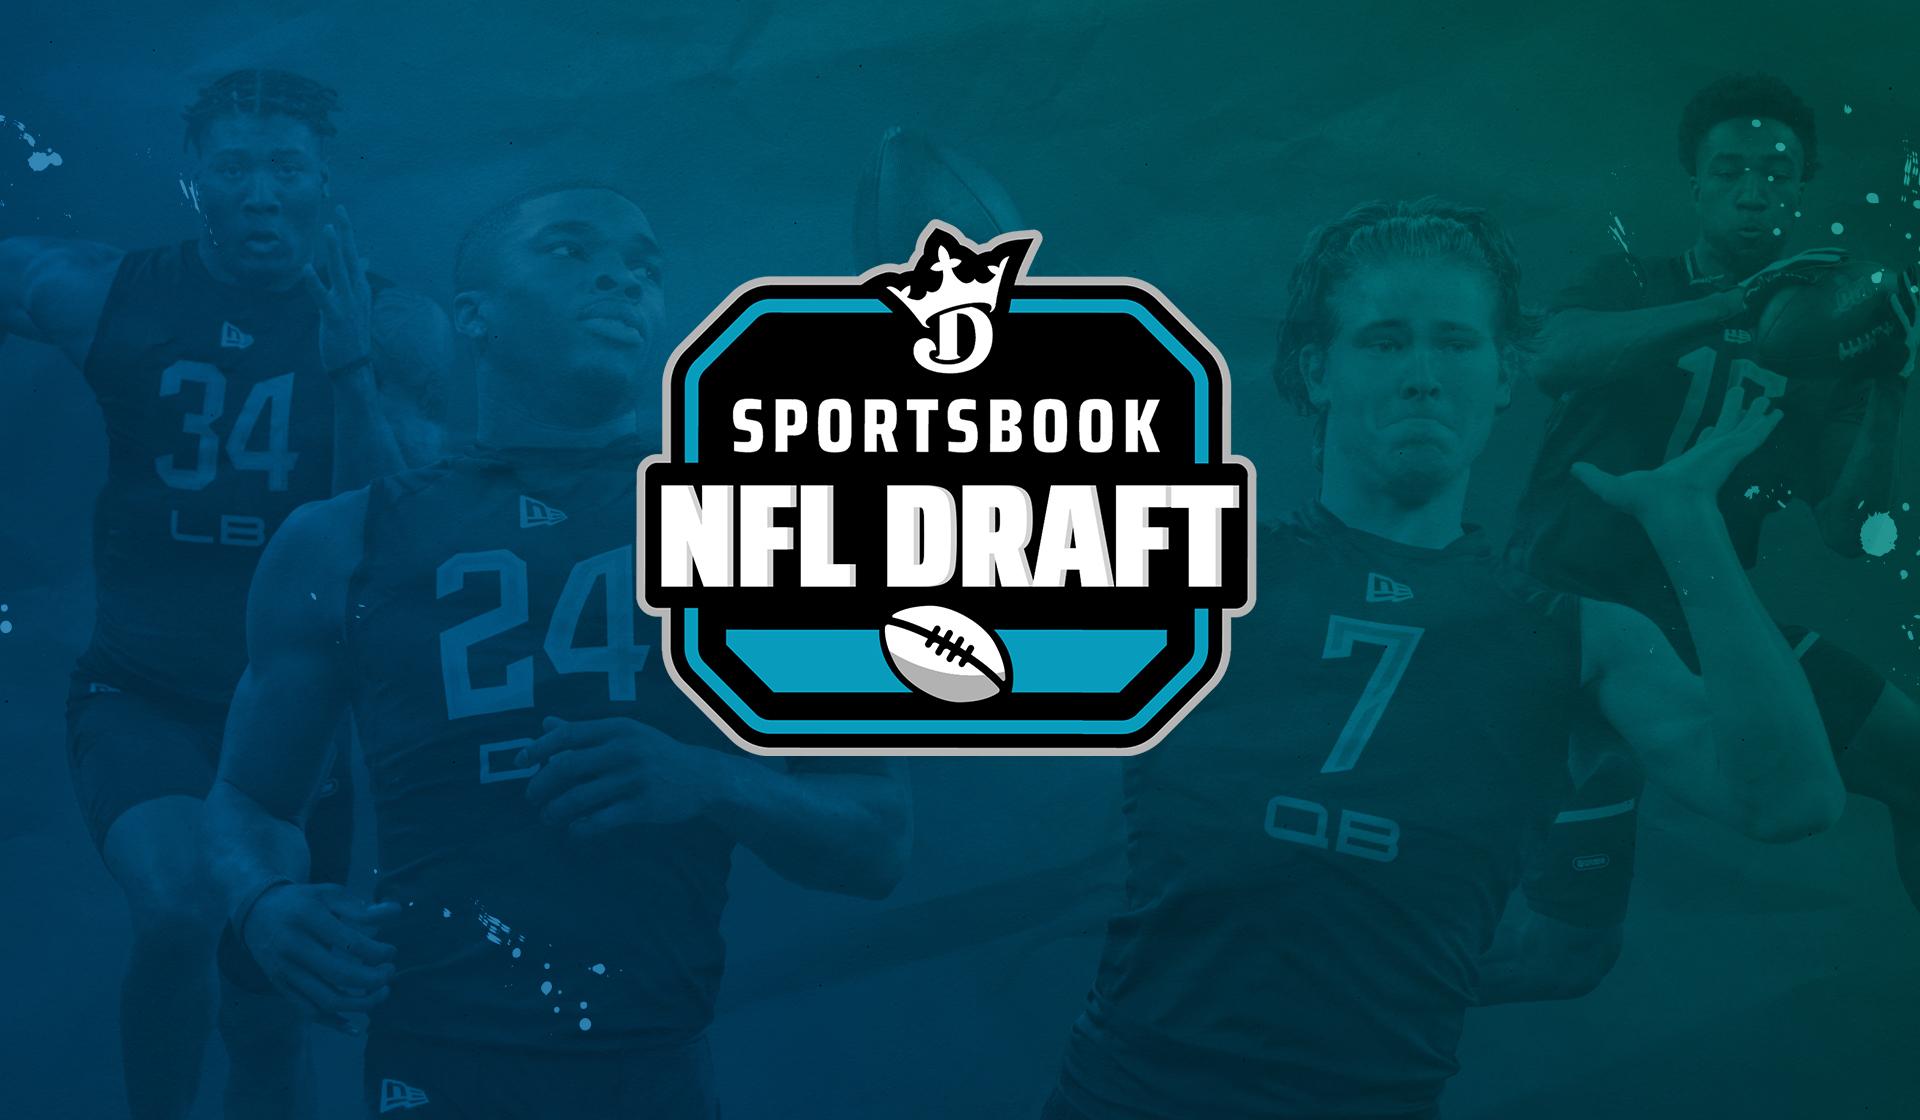 NFL Draft Blue